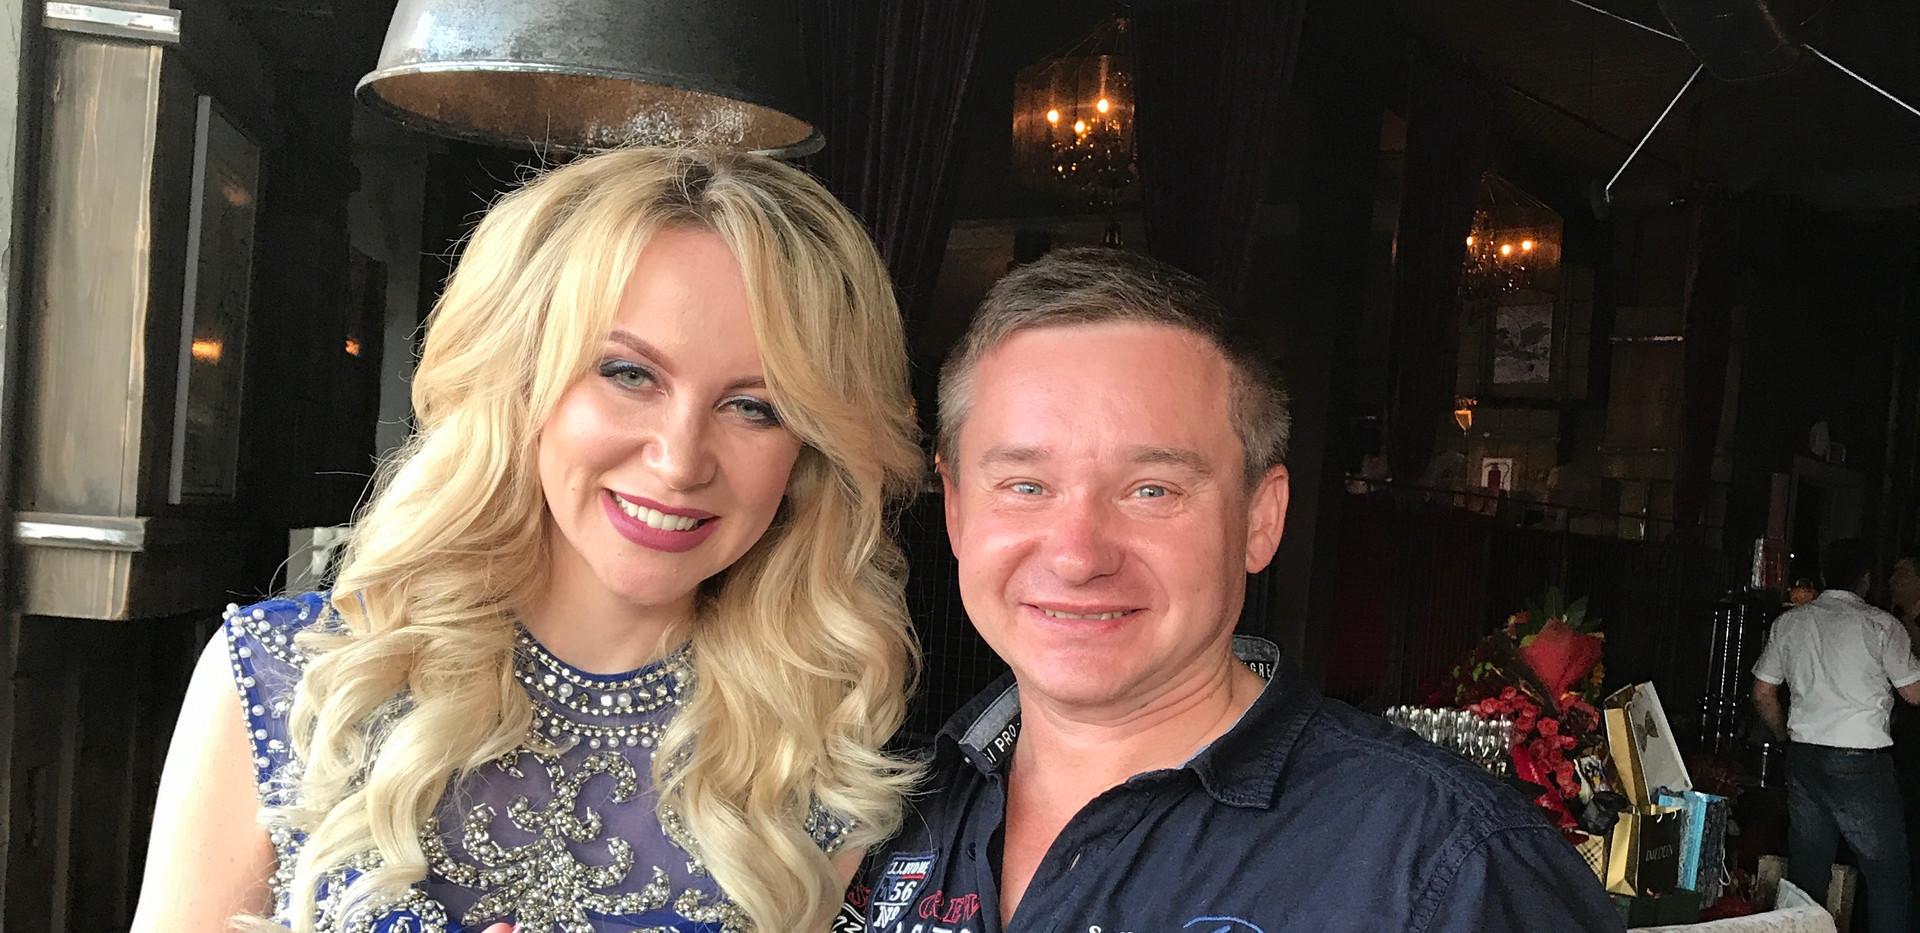 Producent Roman Rossi a moderátorka Maria Ost